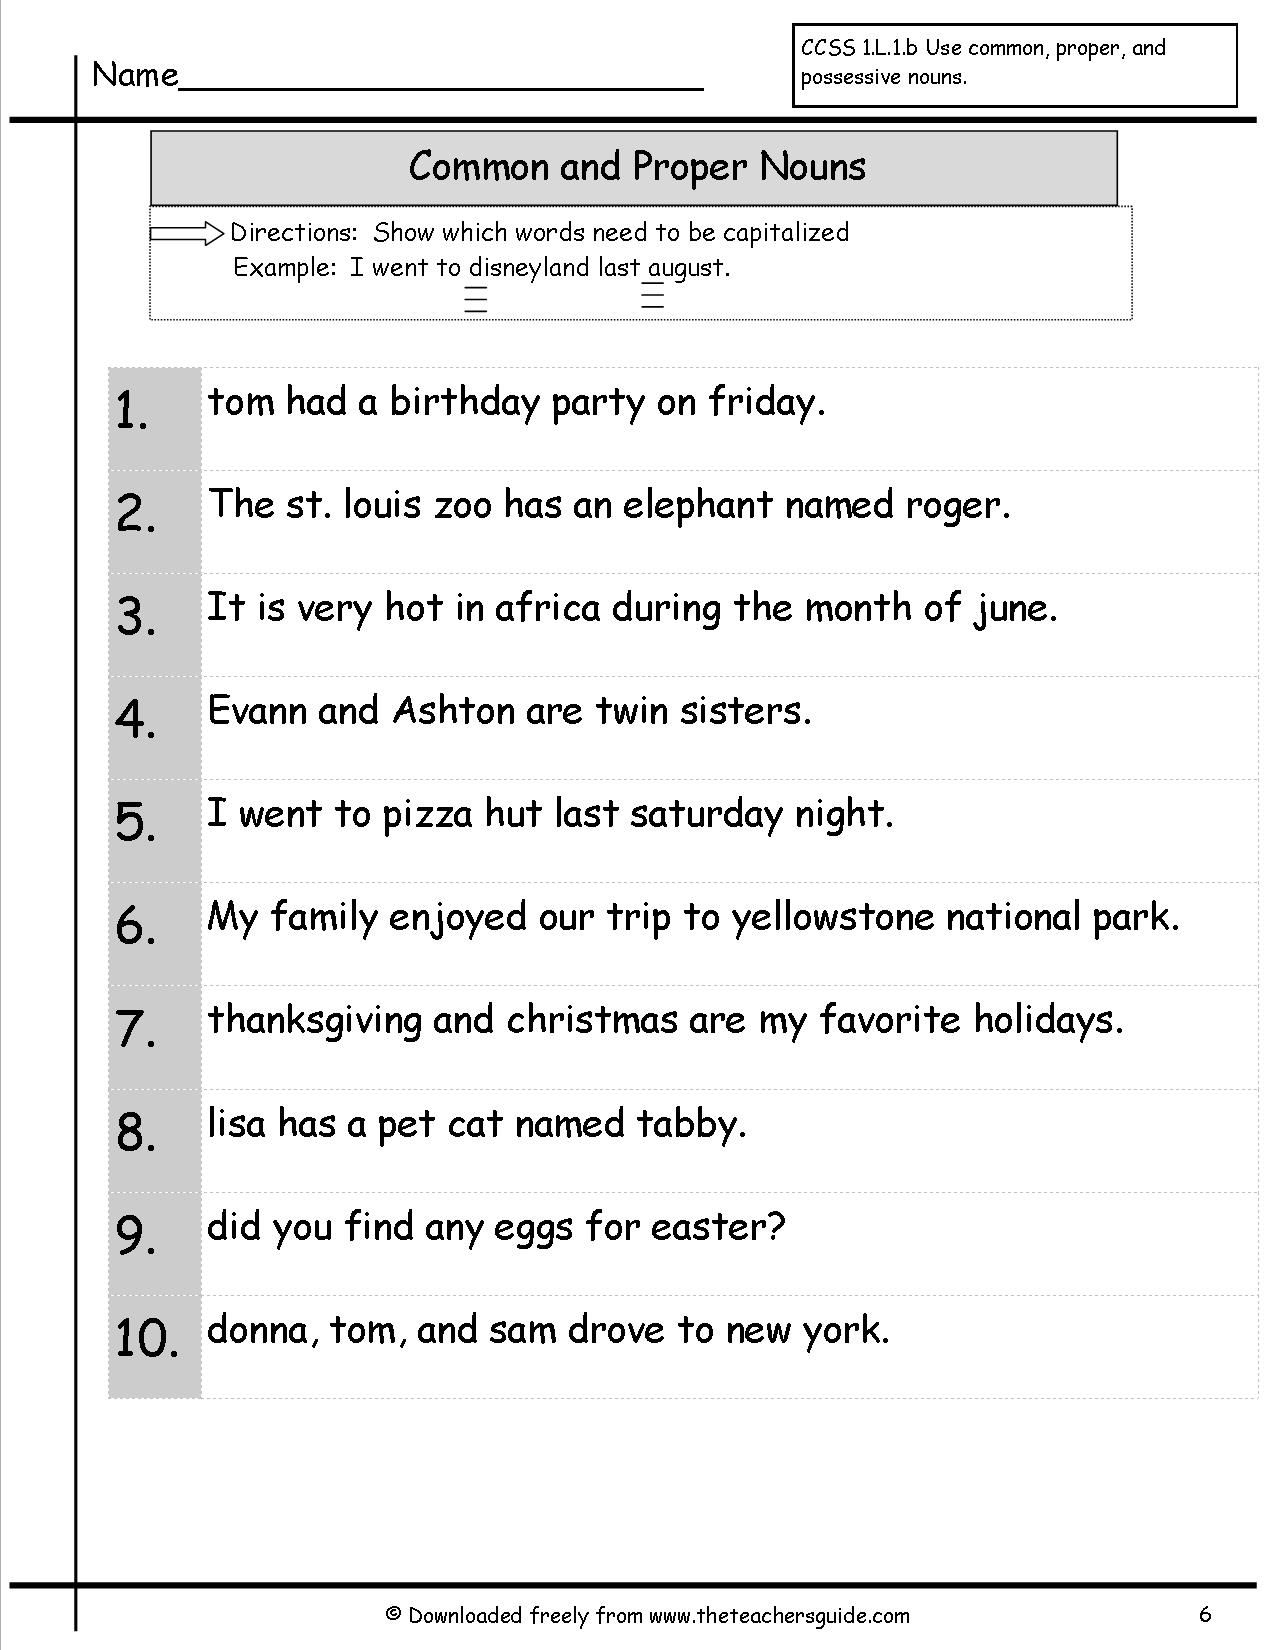 small resolution of https://dubaikhalifas.com/nouns-common-nouns-proper-nouns-worksheets-for-grade-1-2-google-classroom/